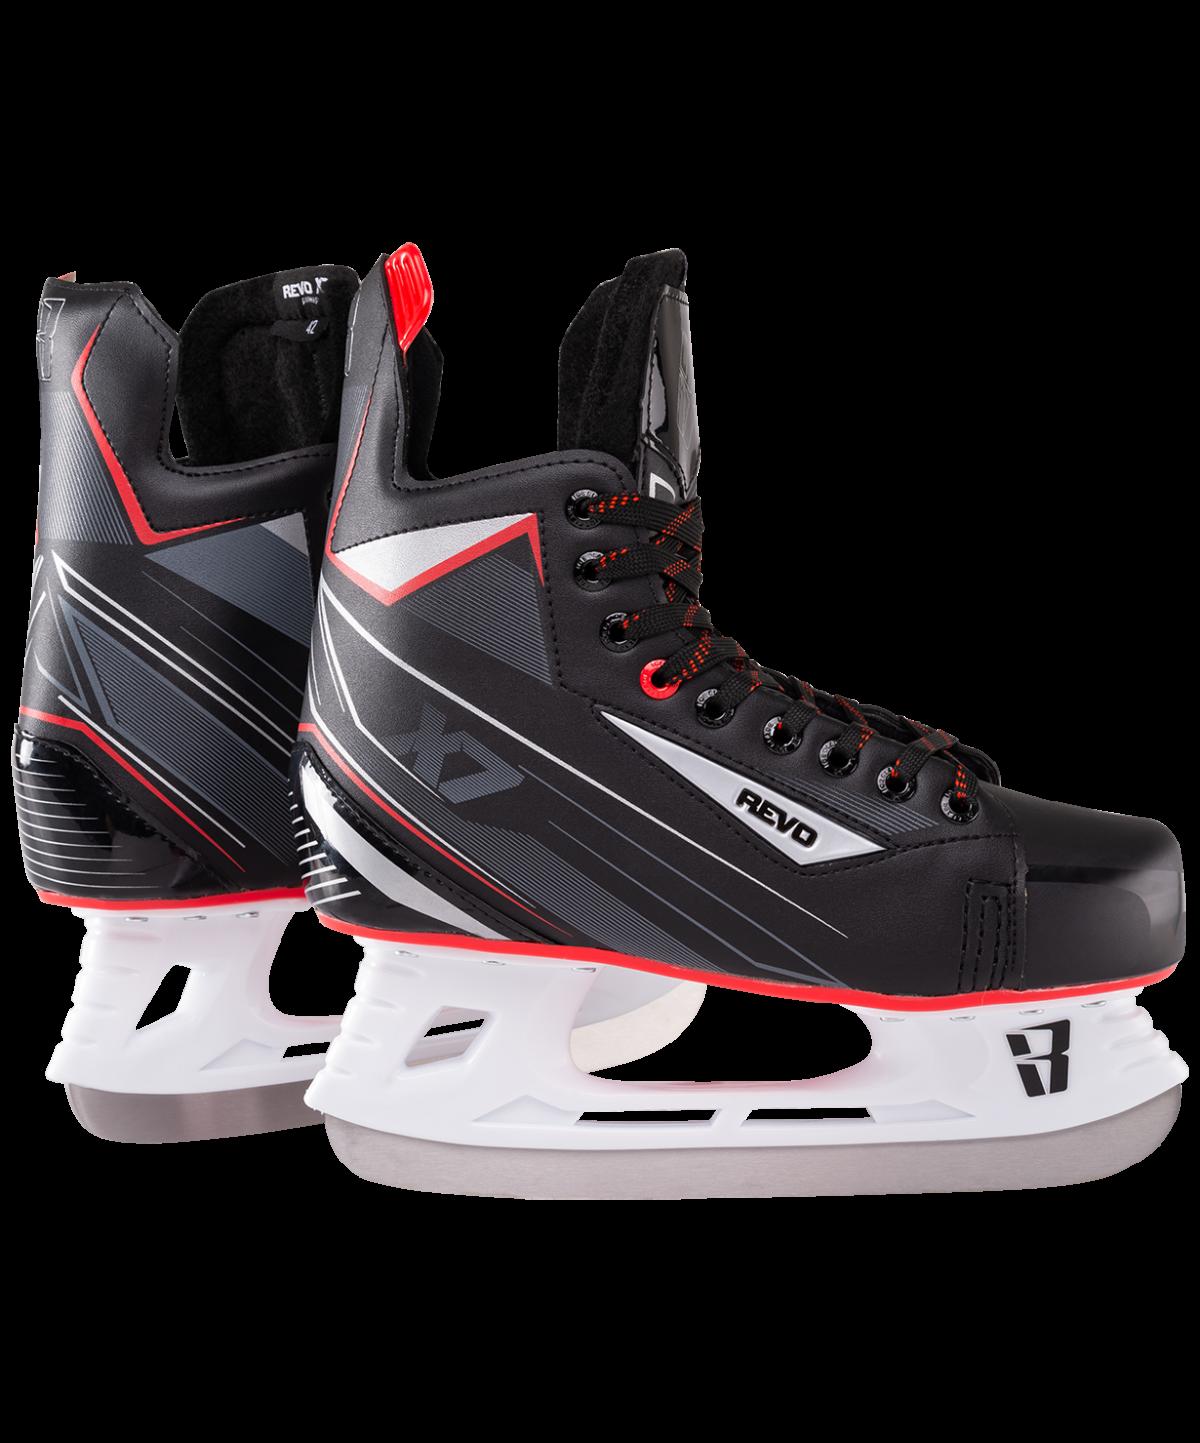 ICE BLADE Коньки хоккейные Revo Х7.0 - 1